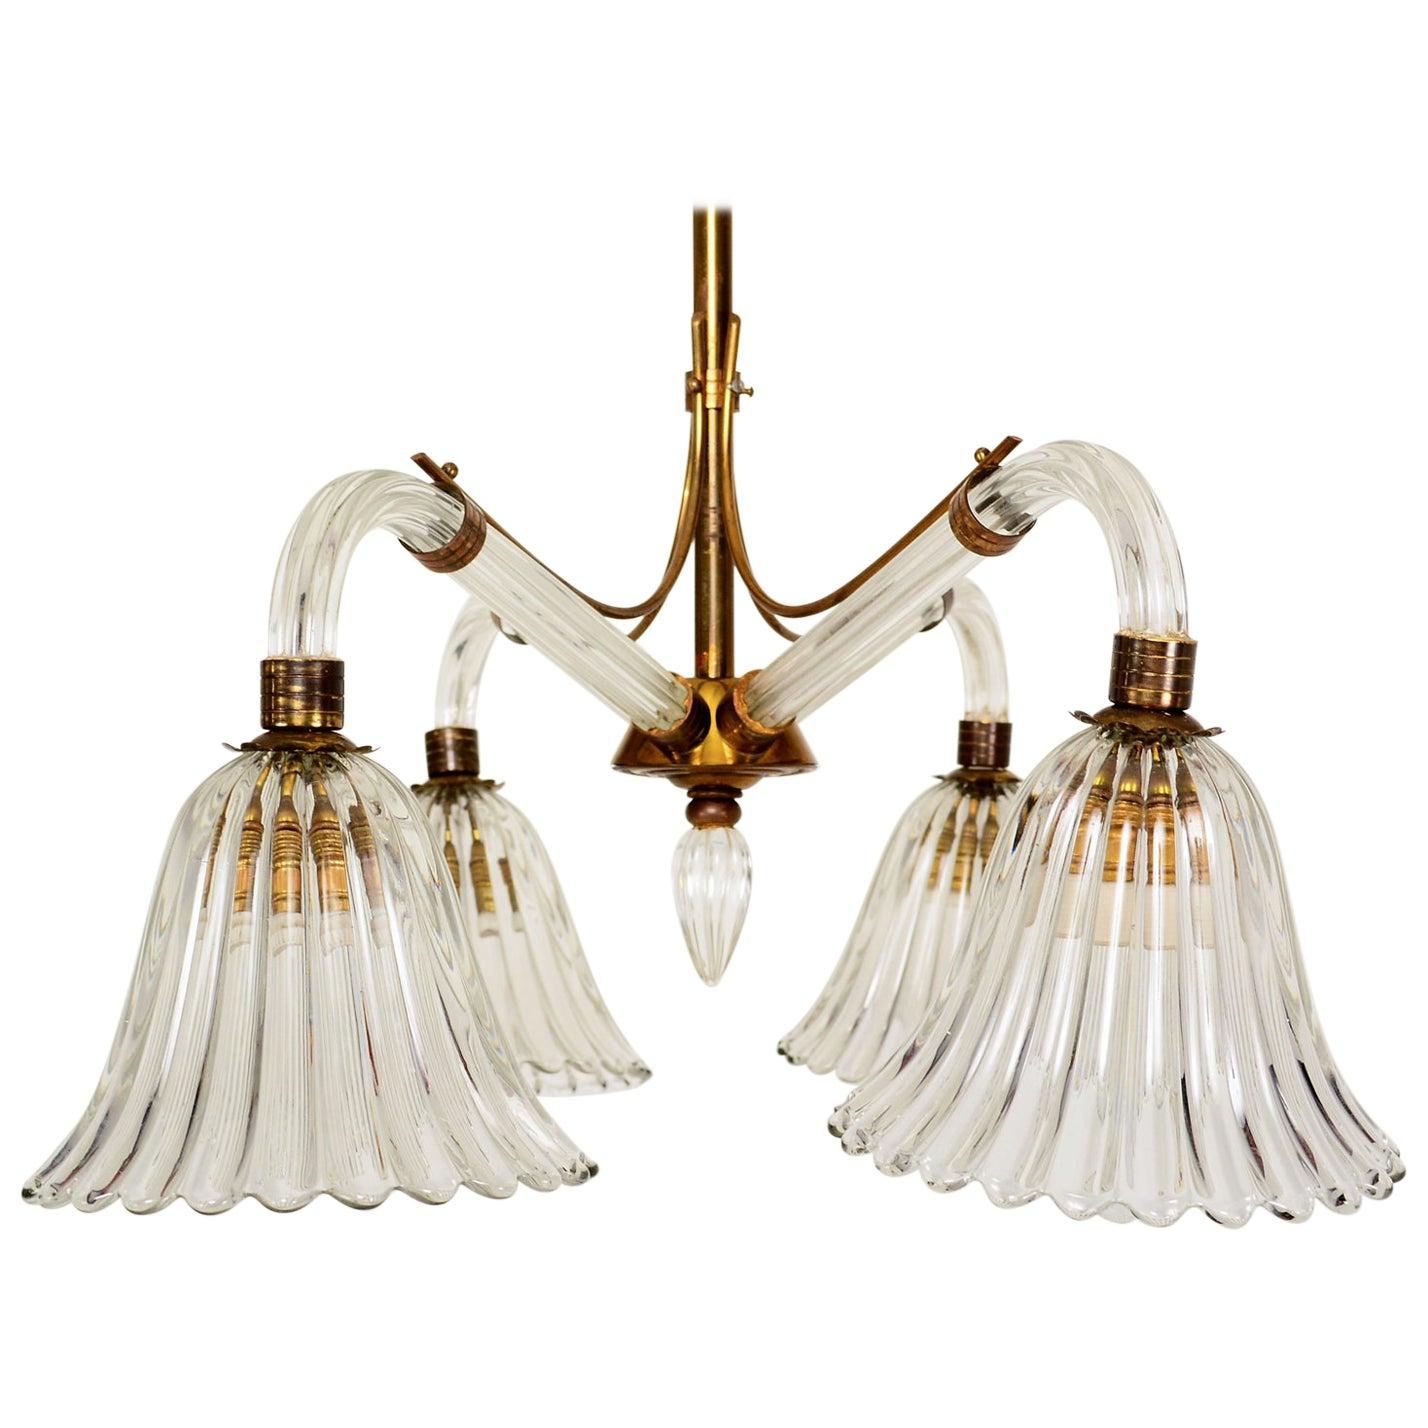 Translucent Venetian Murano Glass Barovier Art Deco Chandelier, 1940s, Italy